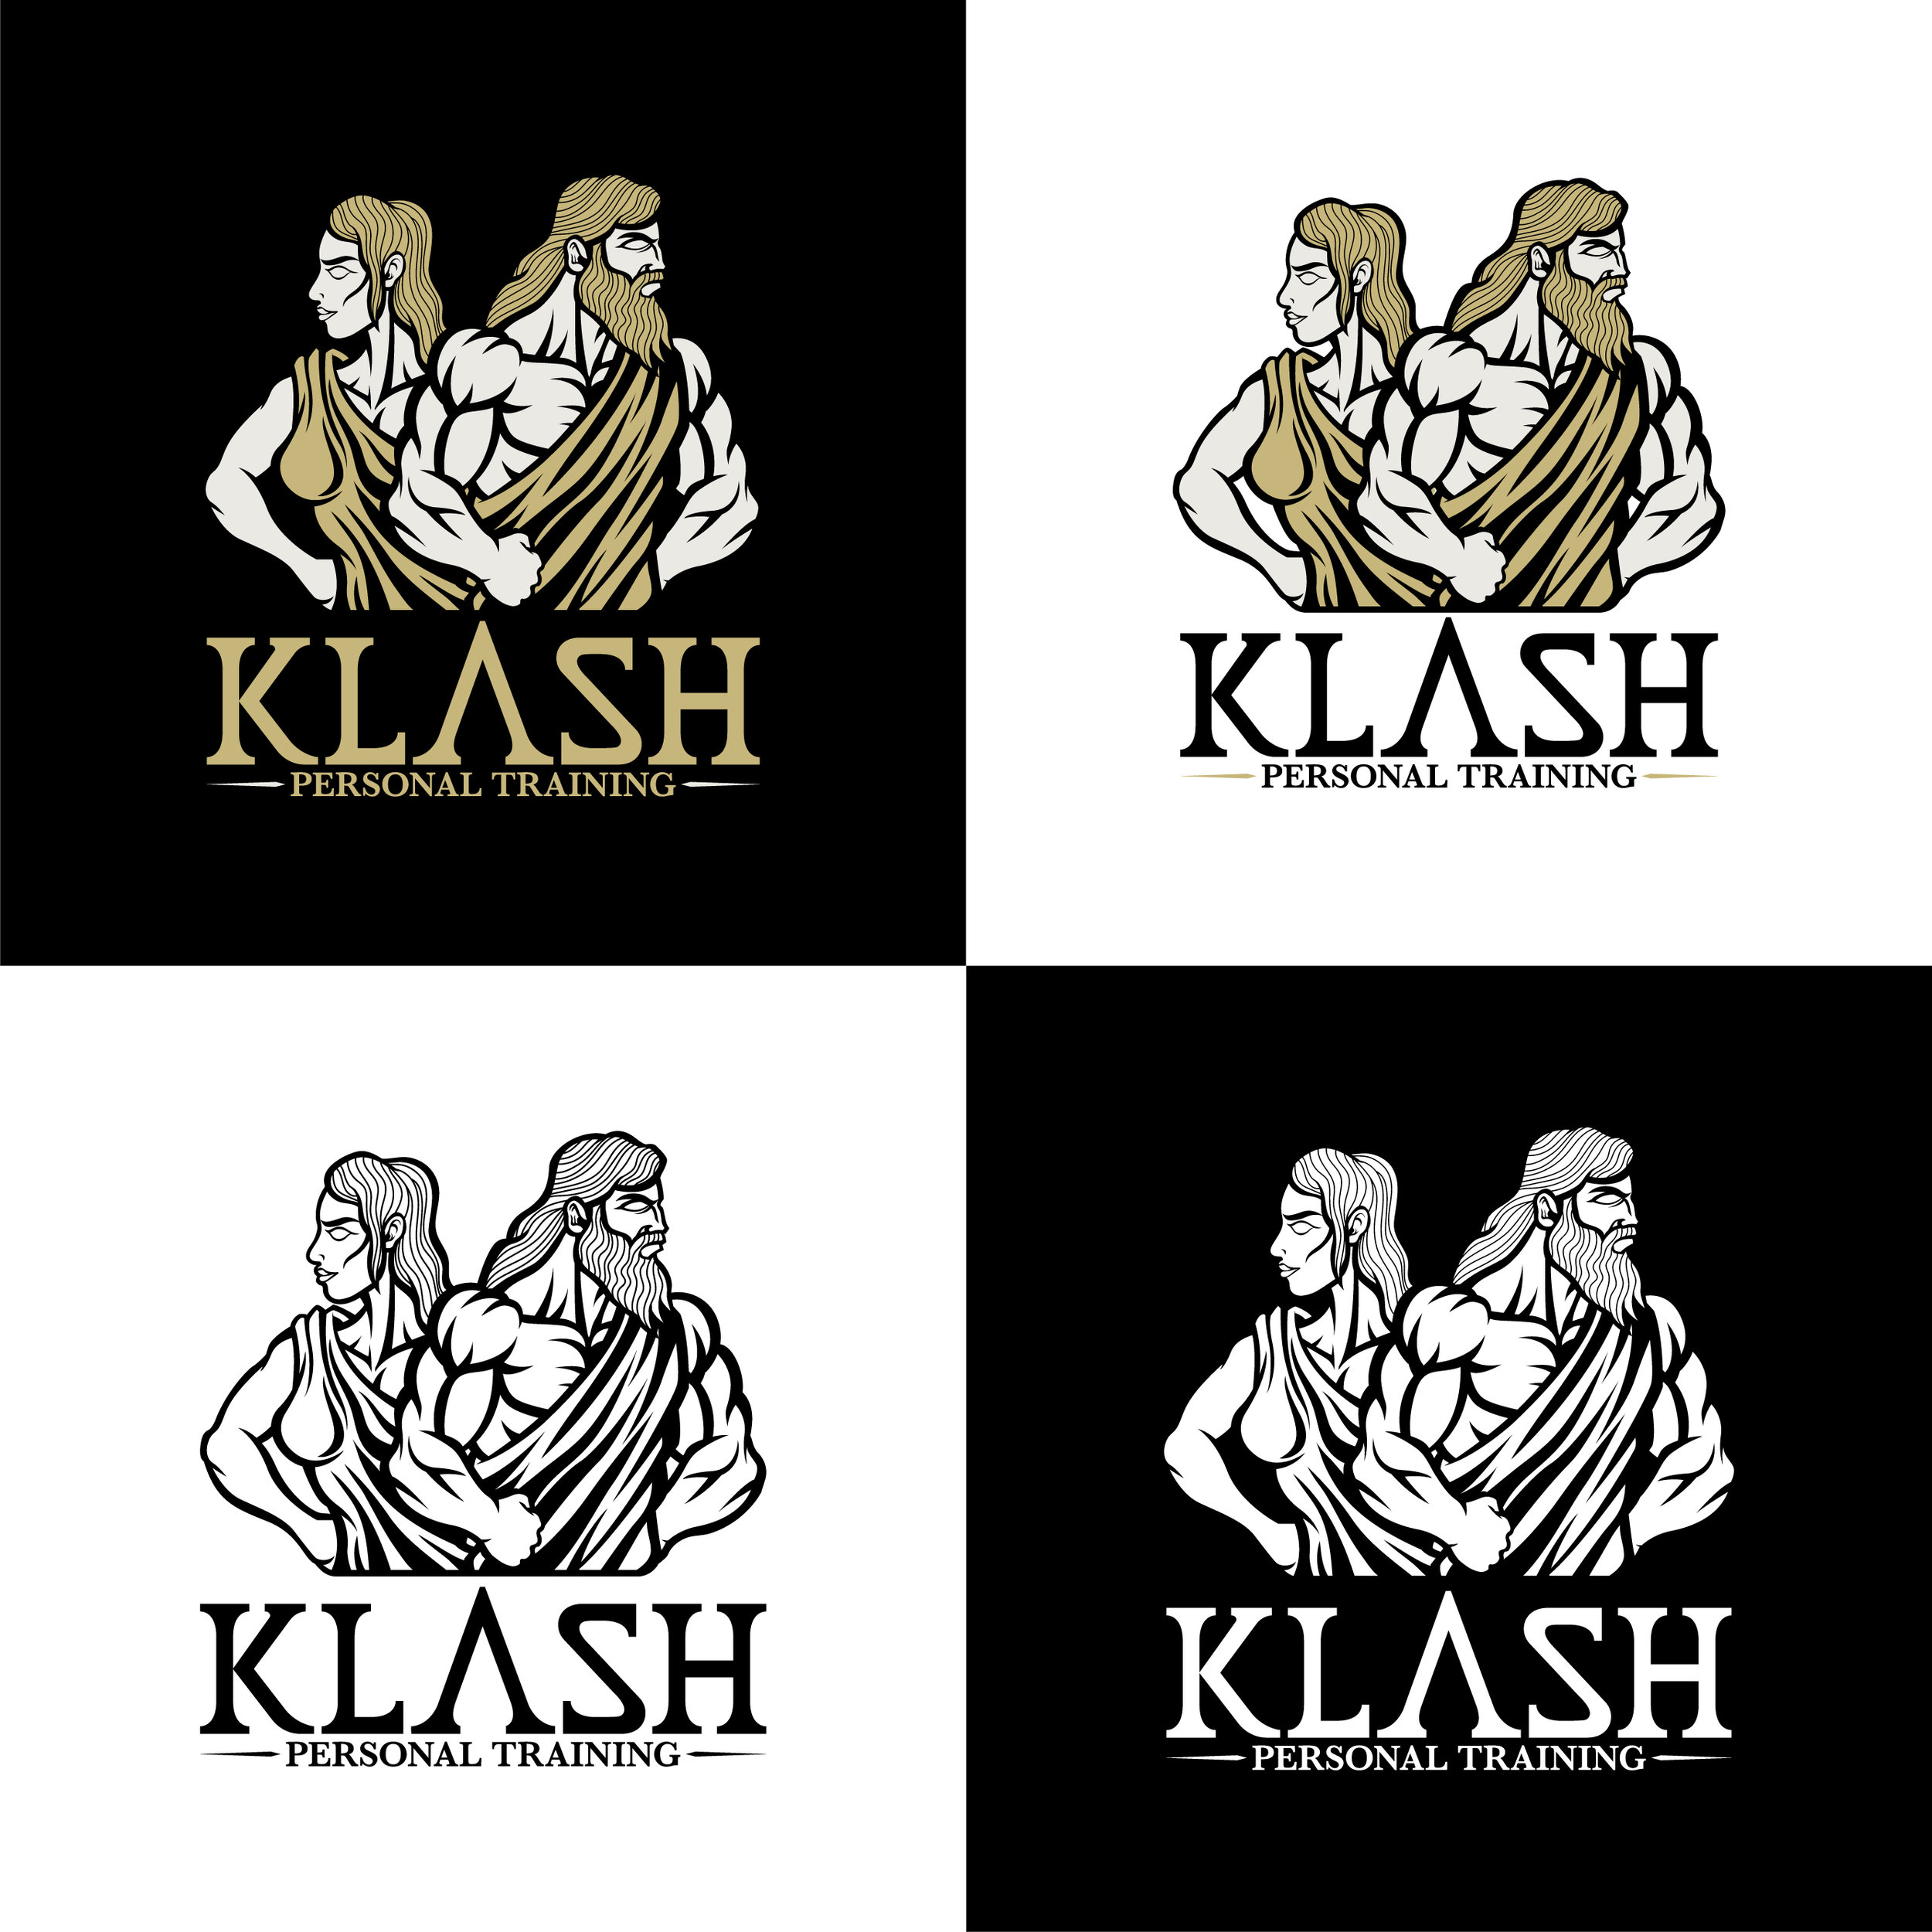 klash-personal-training-logo-logos-branding-greek-roman-graphicdesign-orozco-design-roberto-identity-vegas-lasvegas-vector-black.jpg